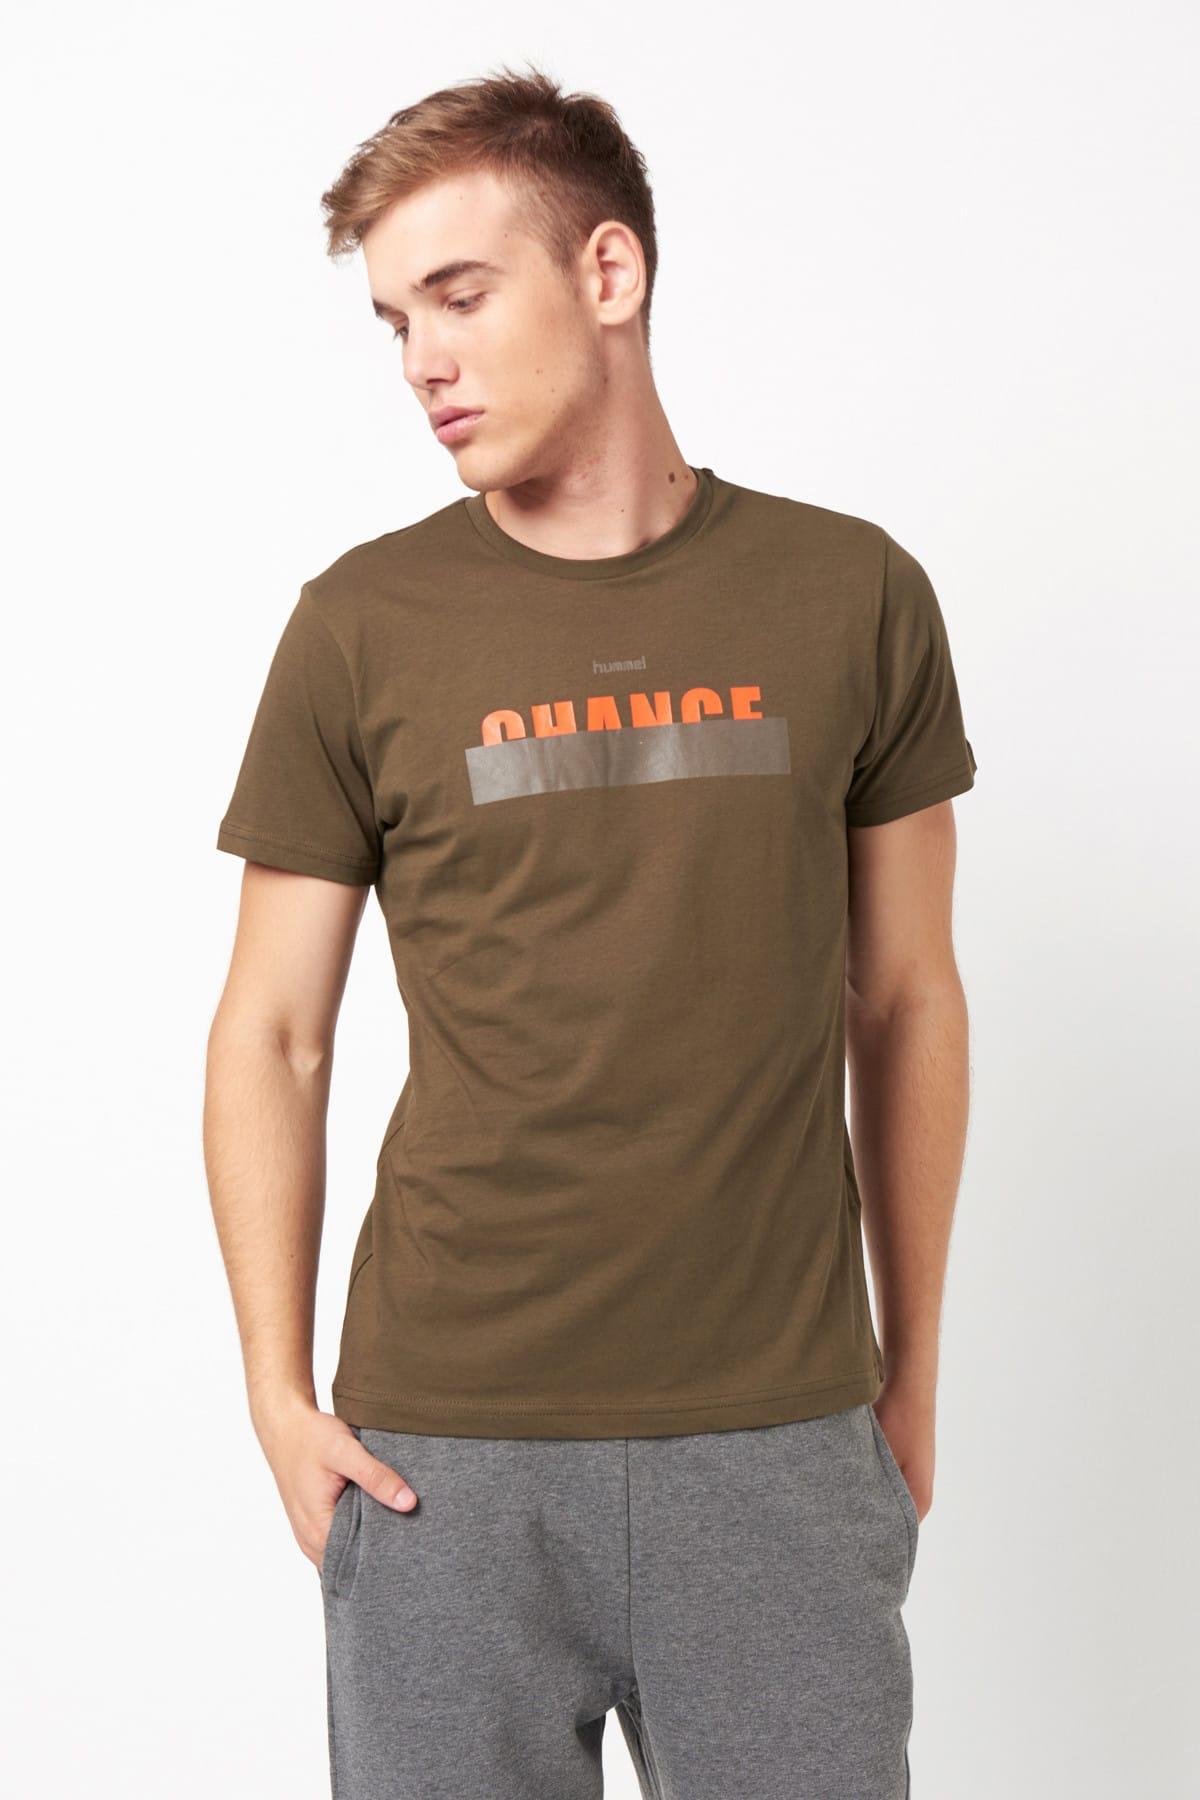 HUMMEL HMLENZO  T-SHIRT S/S TEE Koyu Haki Erkek T-Shirt 100579829 1